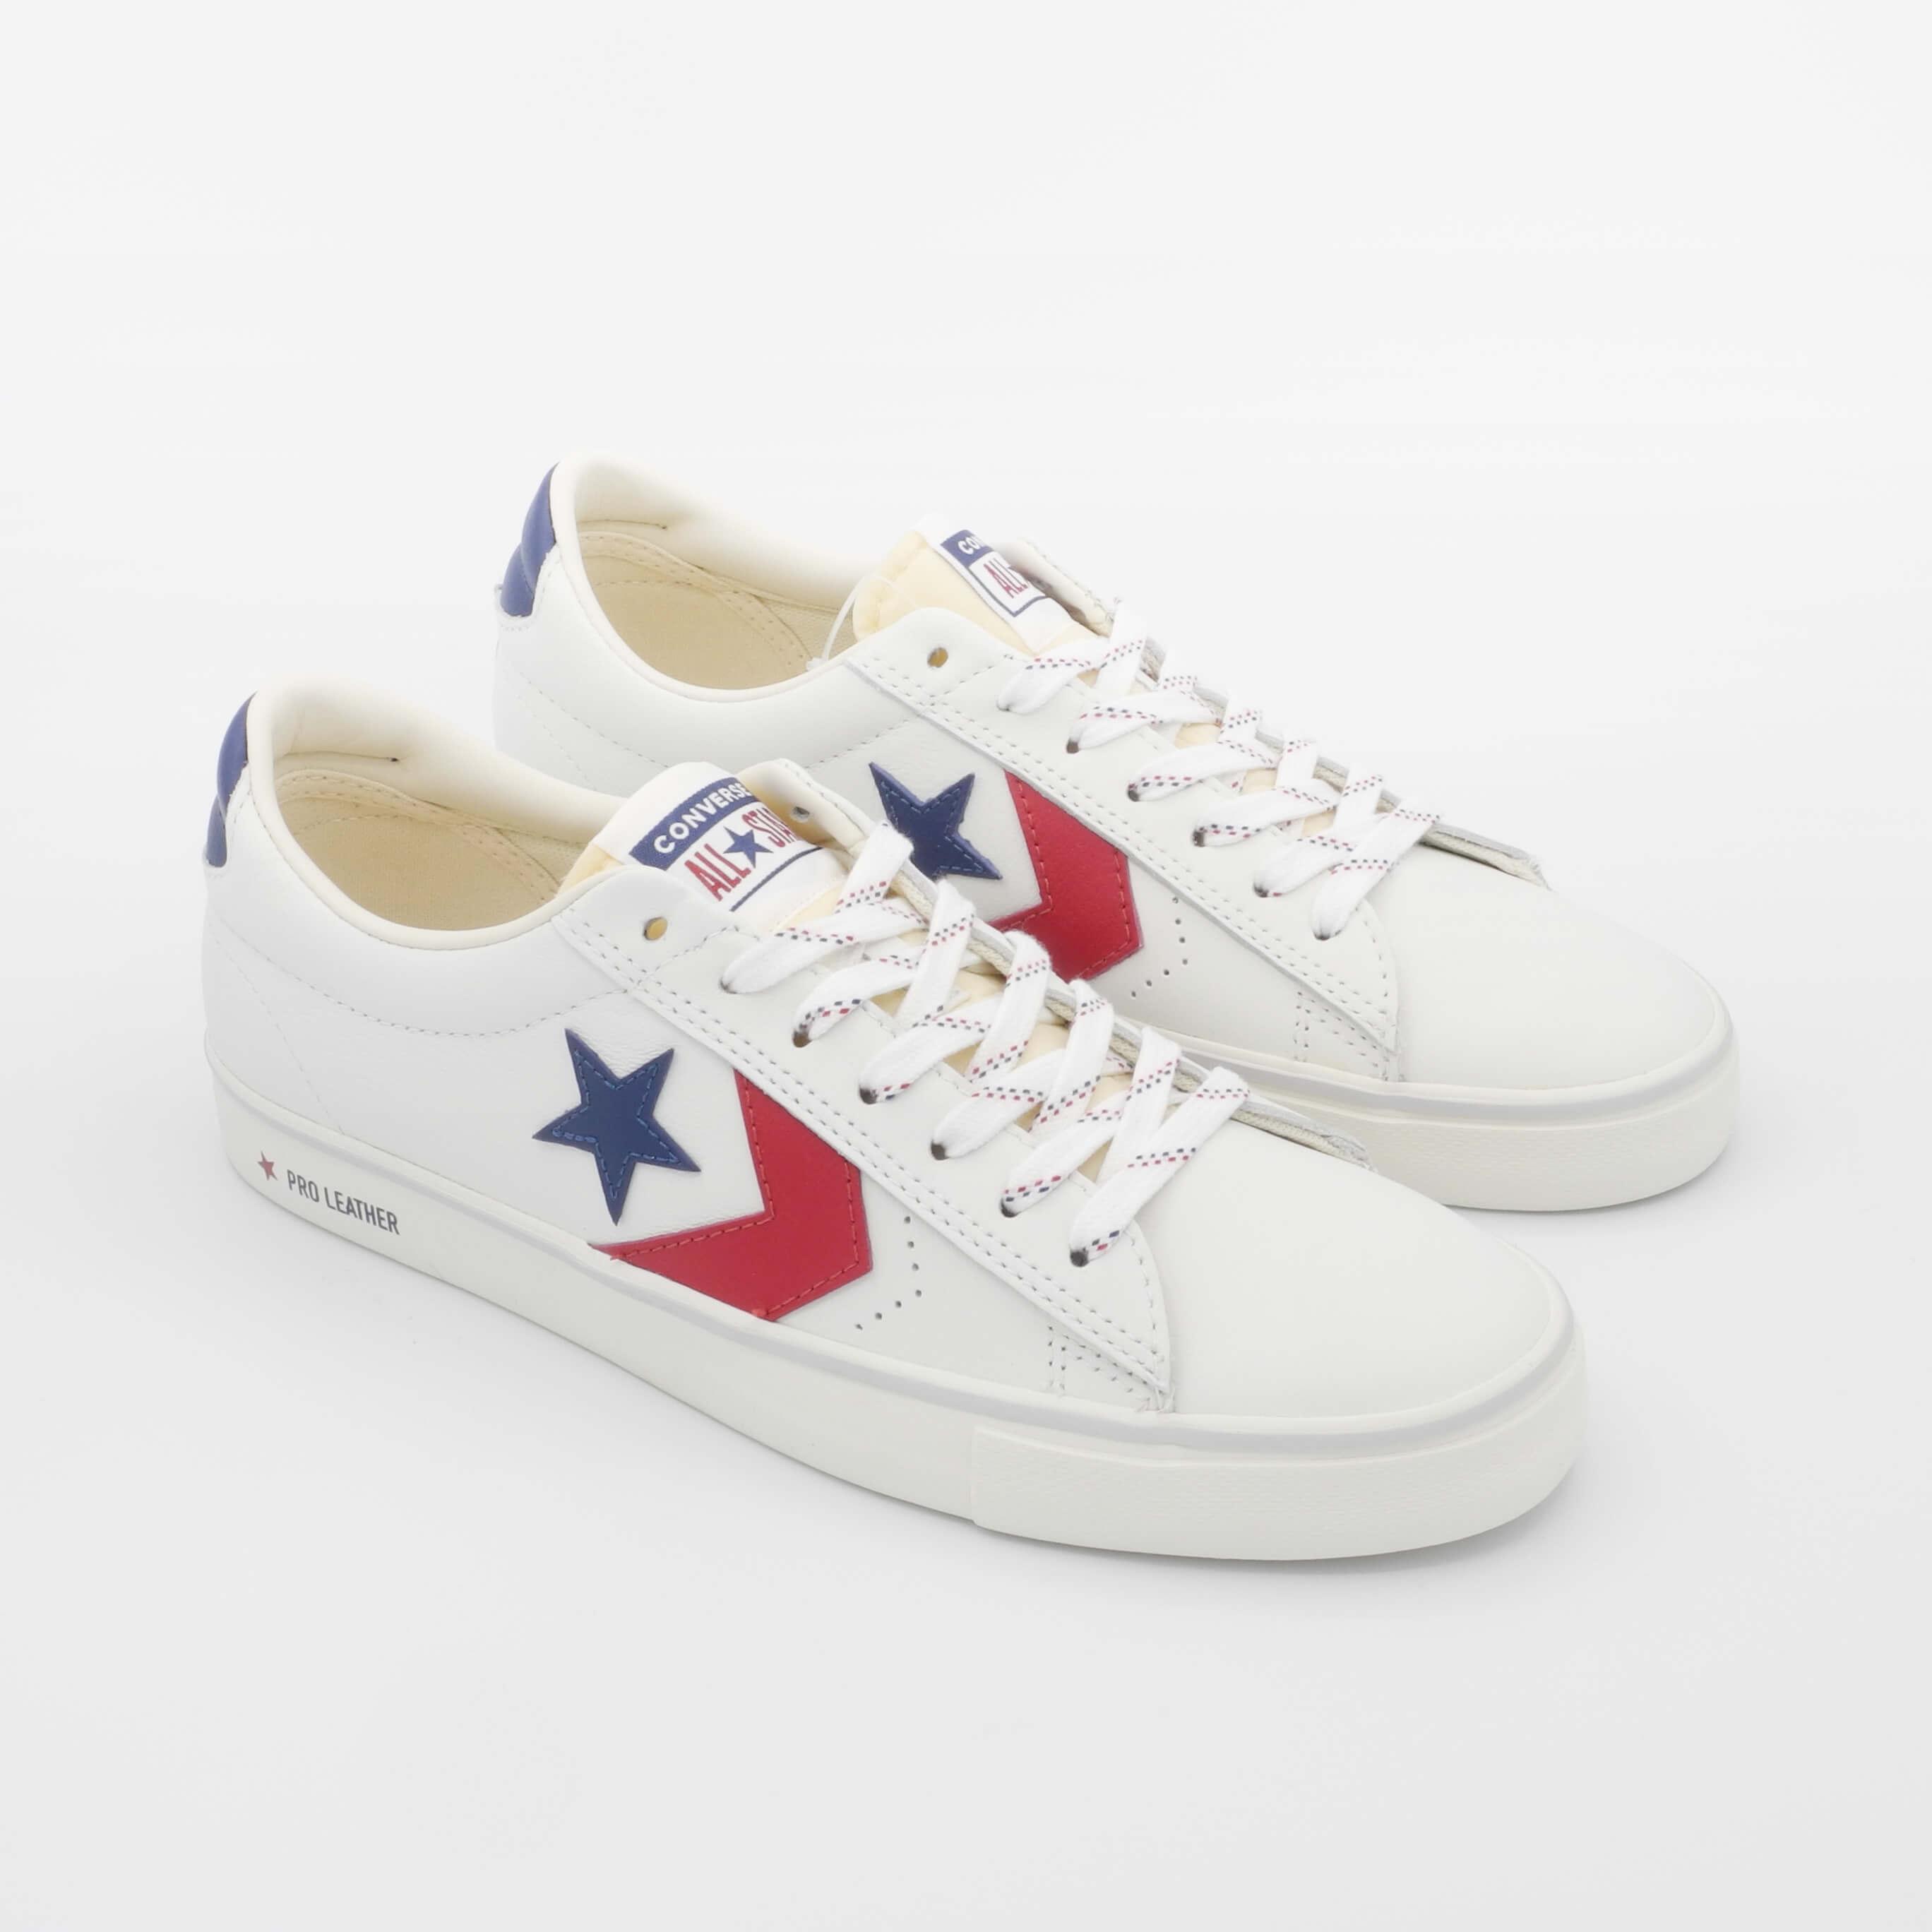 Sneakers pelle bianca Converse Pro Leather Vulc Ox 164034C